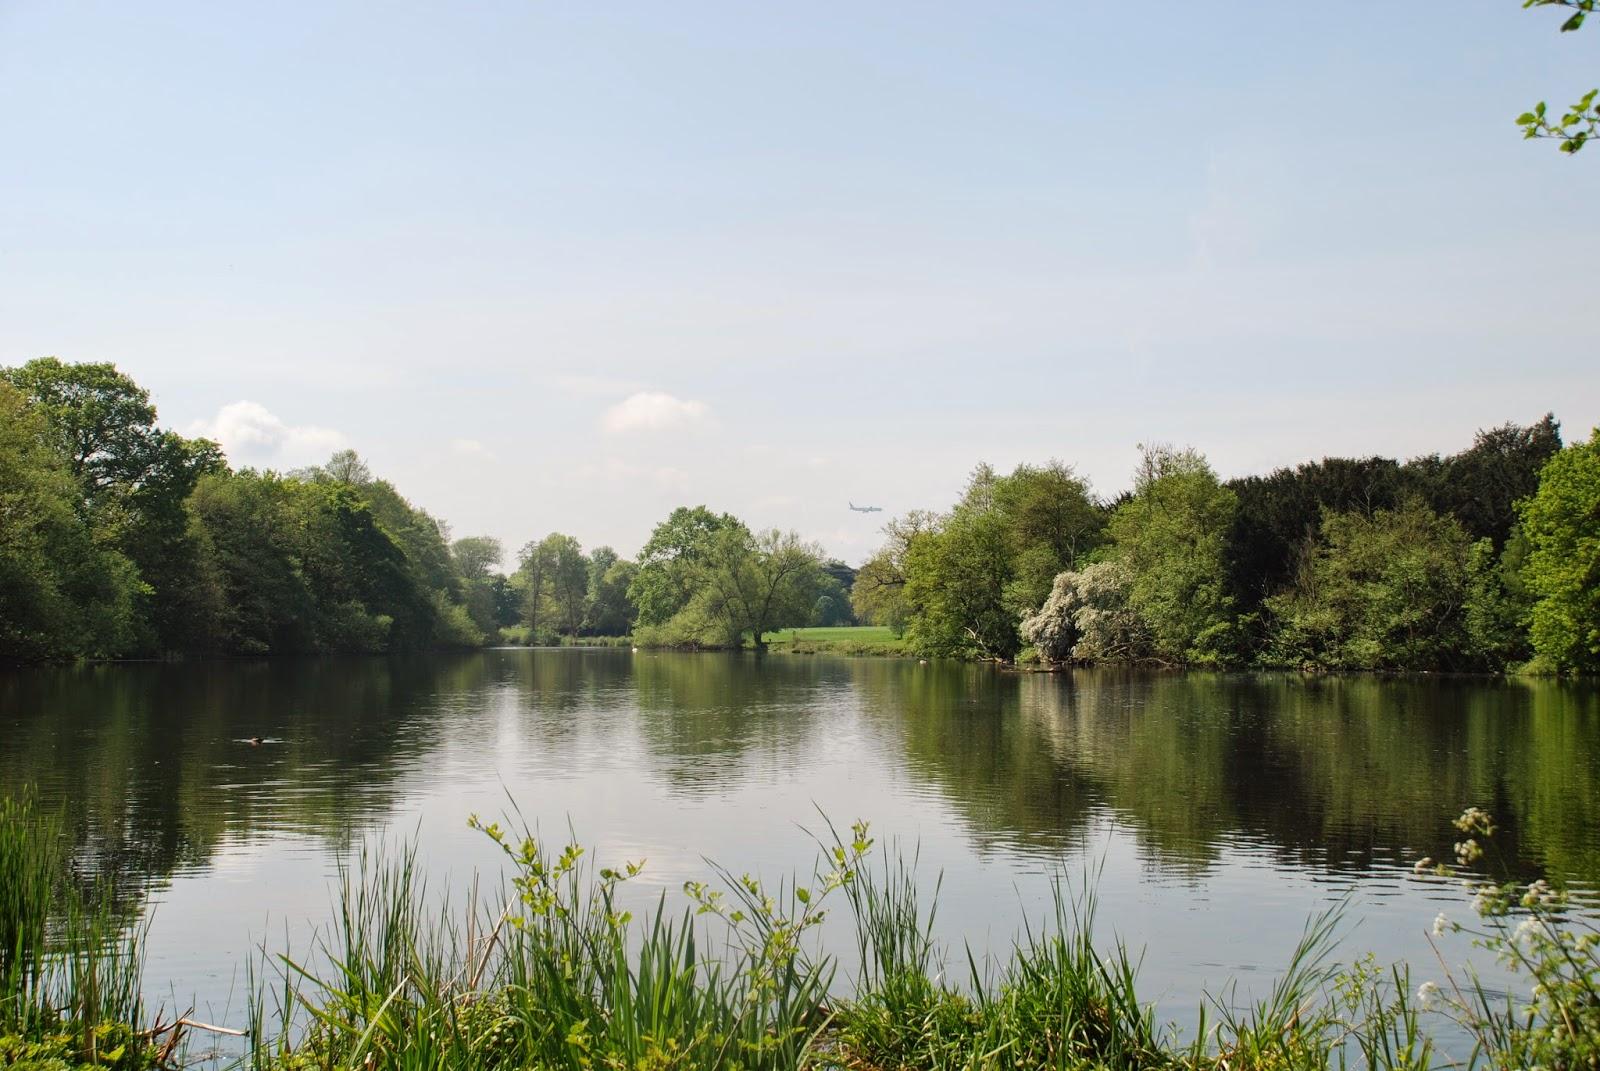 Osterley Park, West London